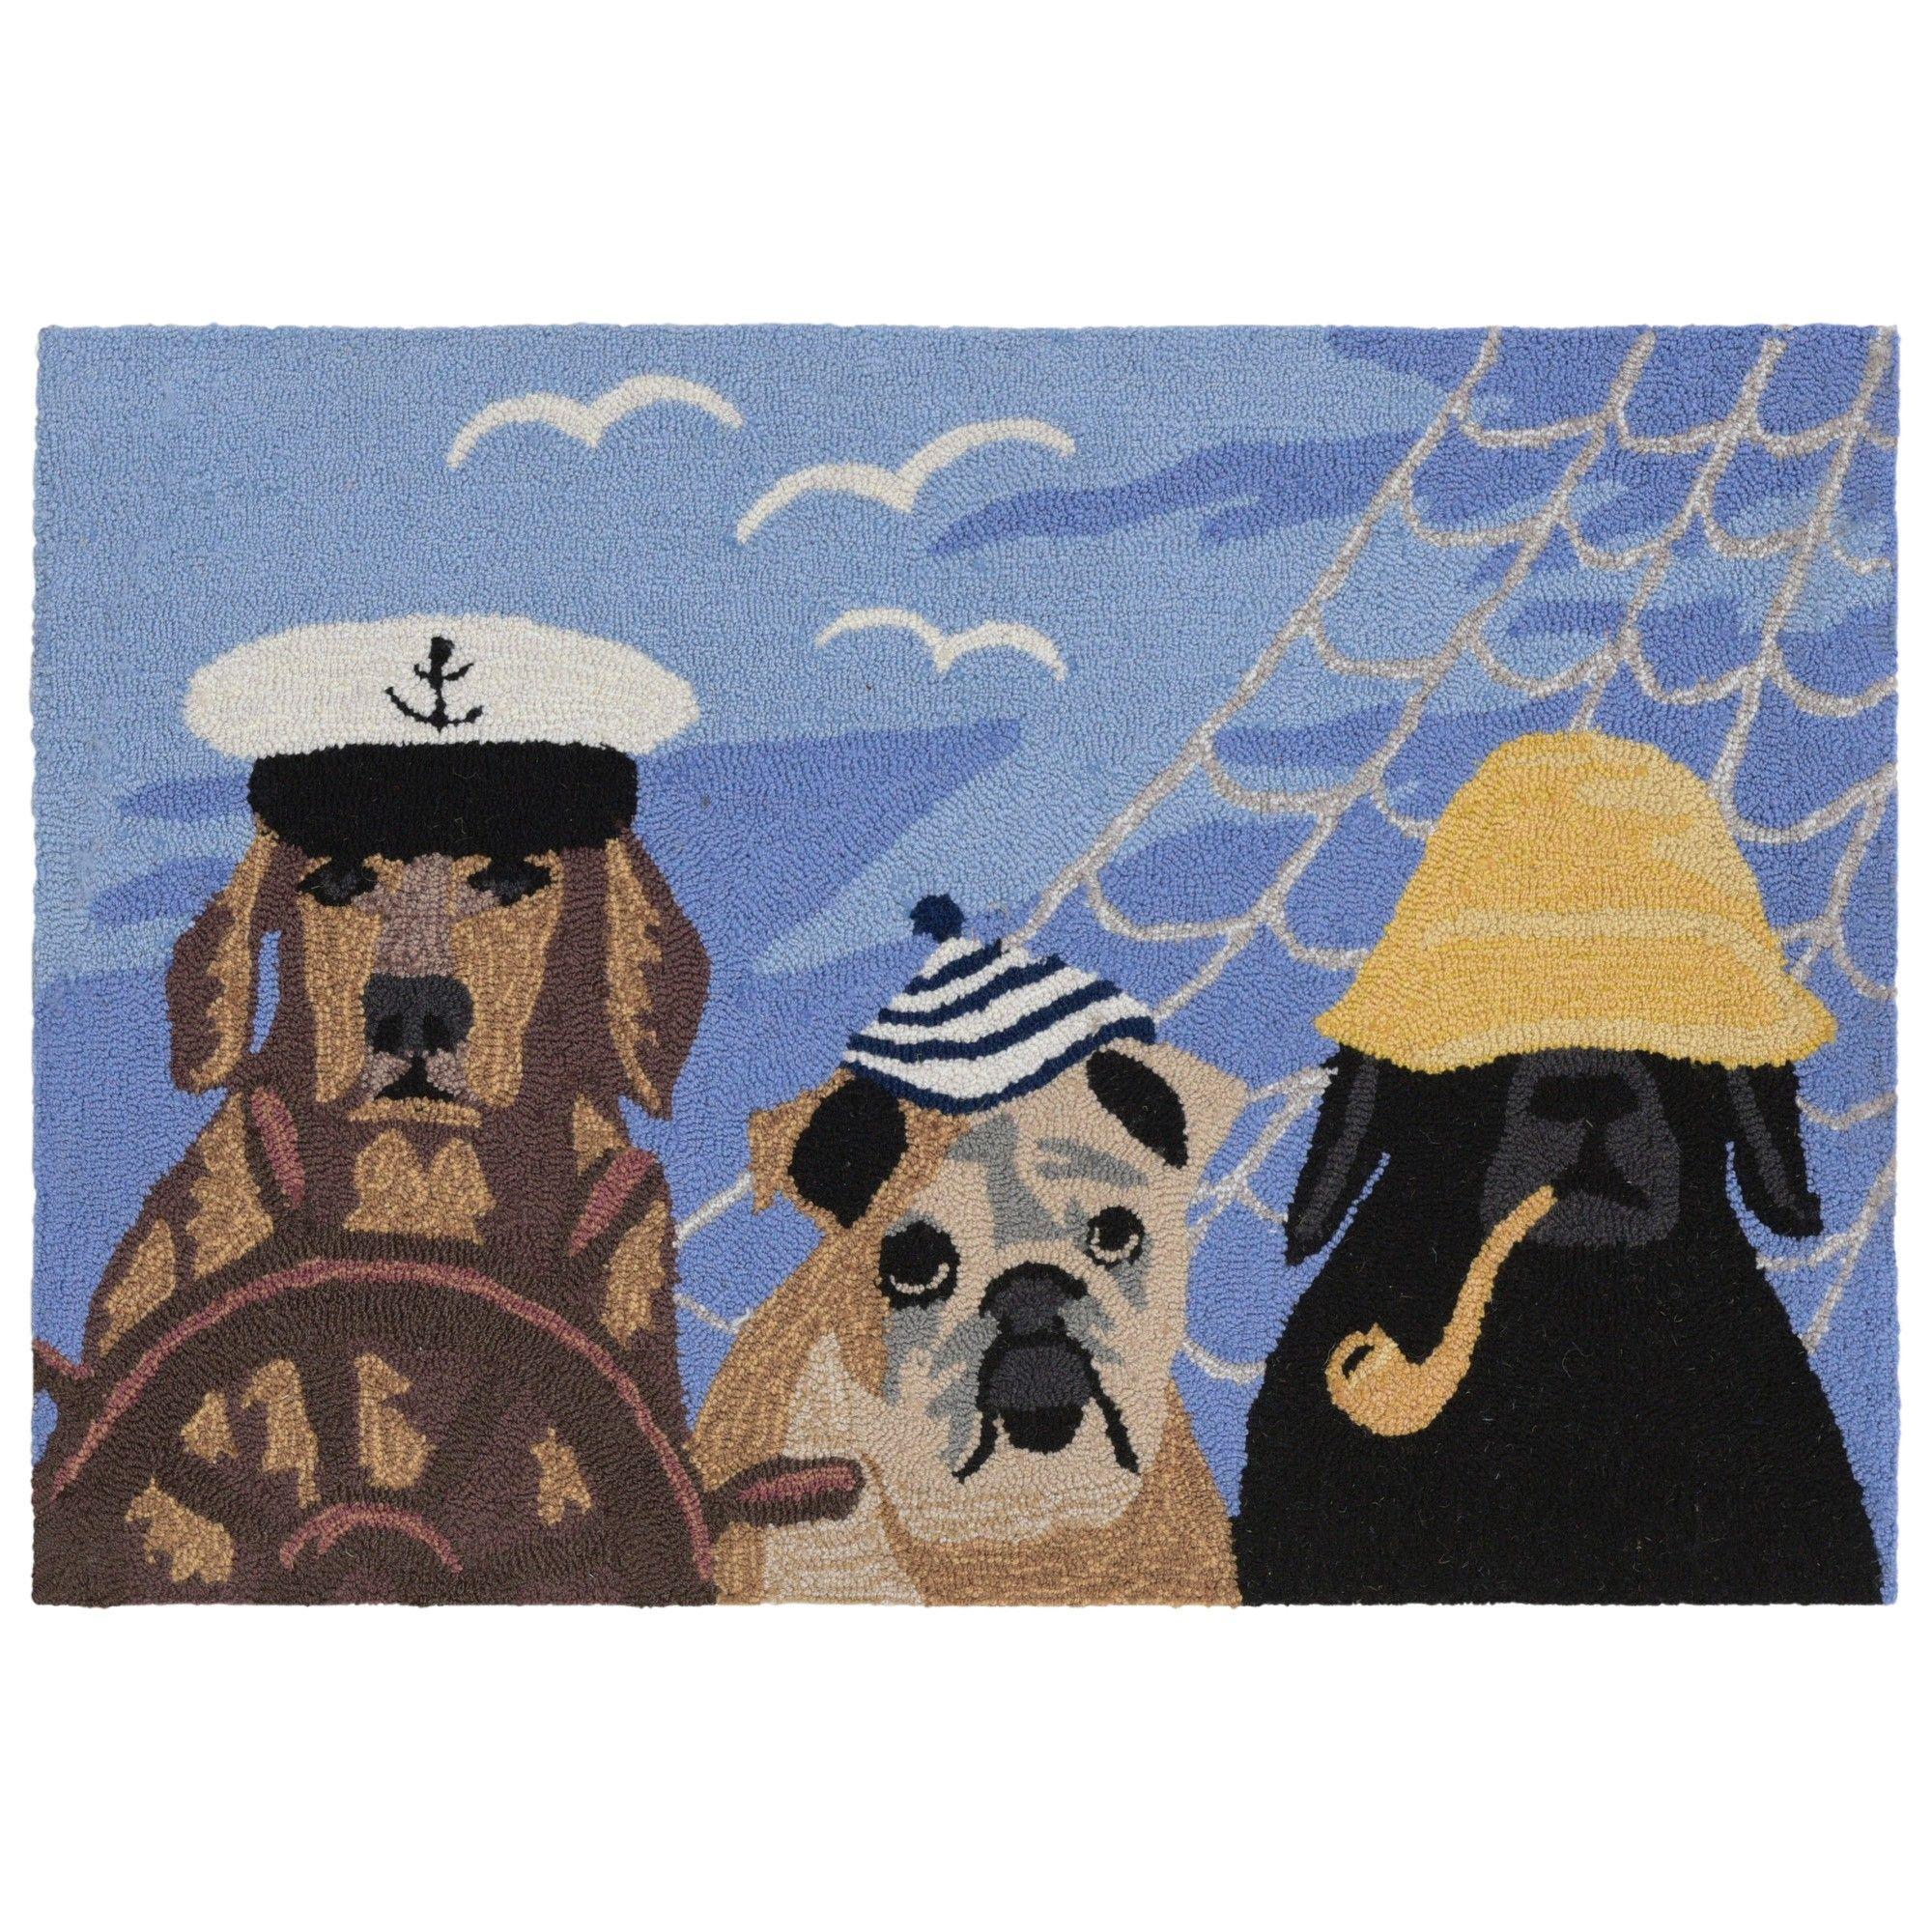 2 6x4 Dogs Accent Rug Ocean Blue Liora Manne